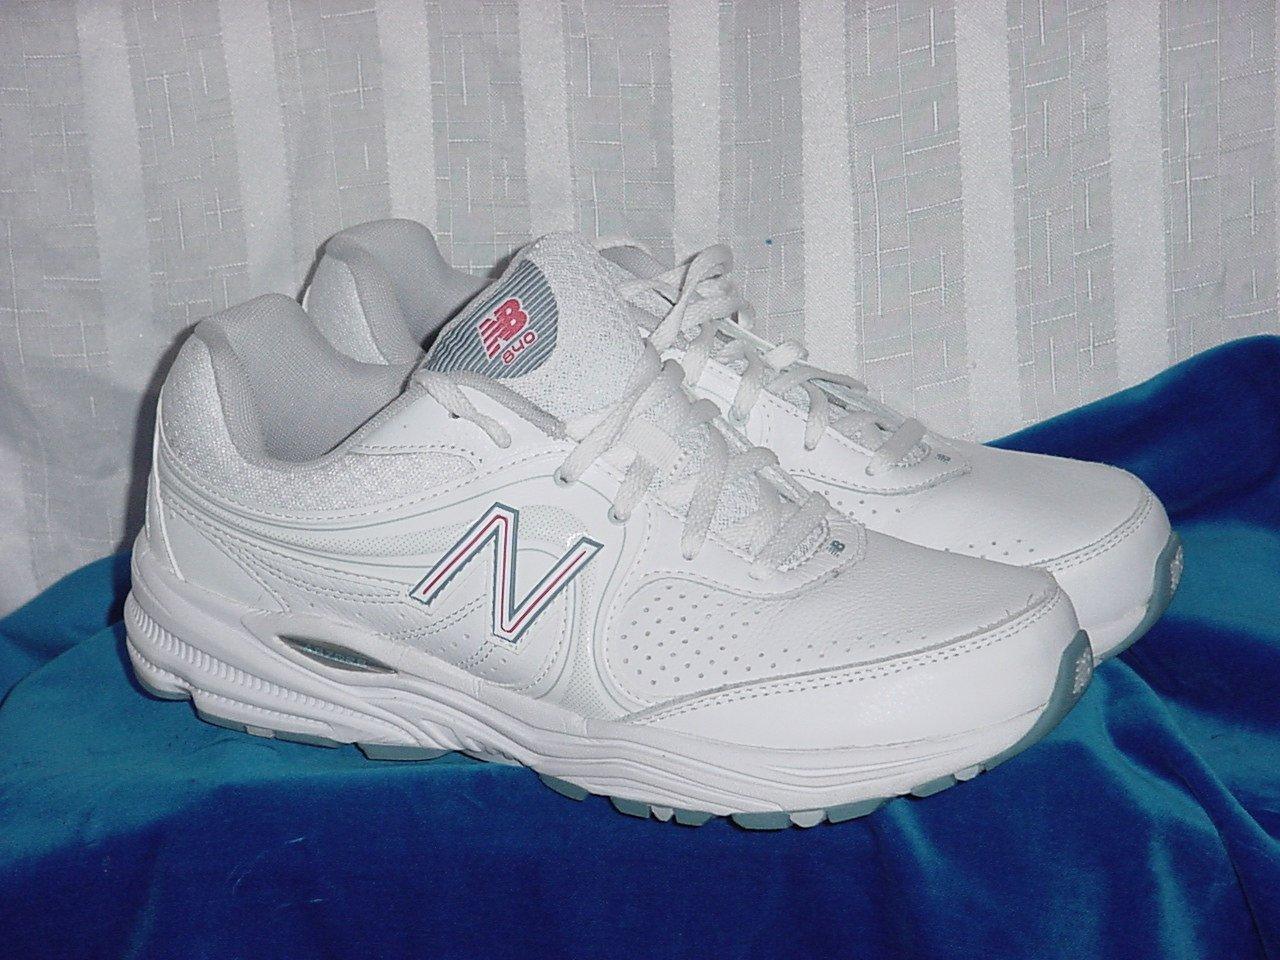 New Balance Women's Walking Training Shoes WW840WP White Pink Size 10 B 189